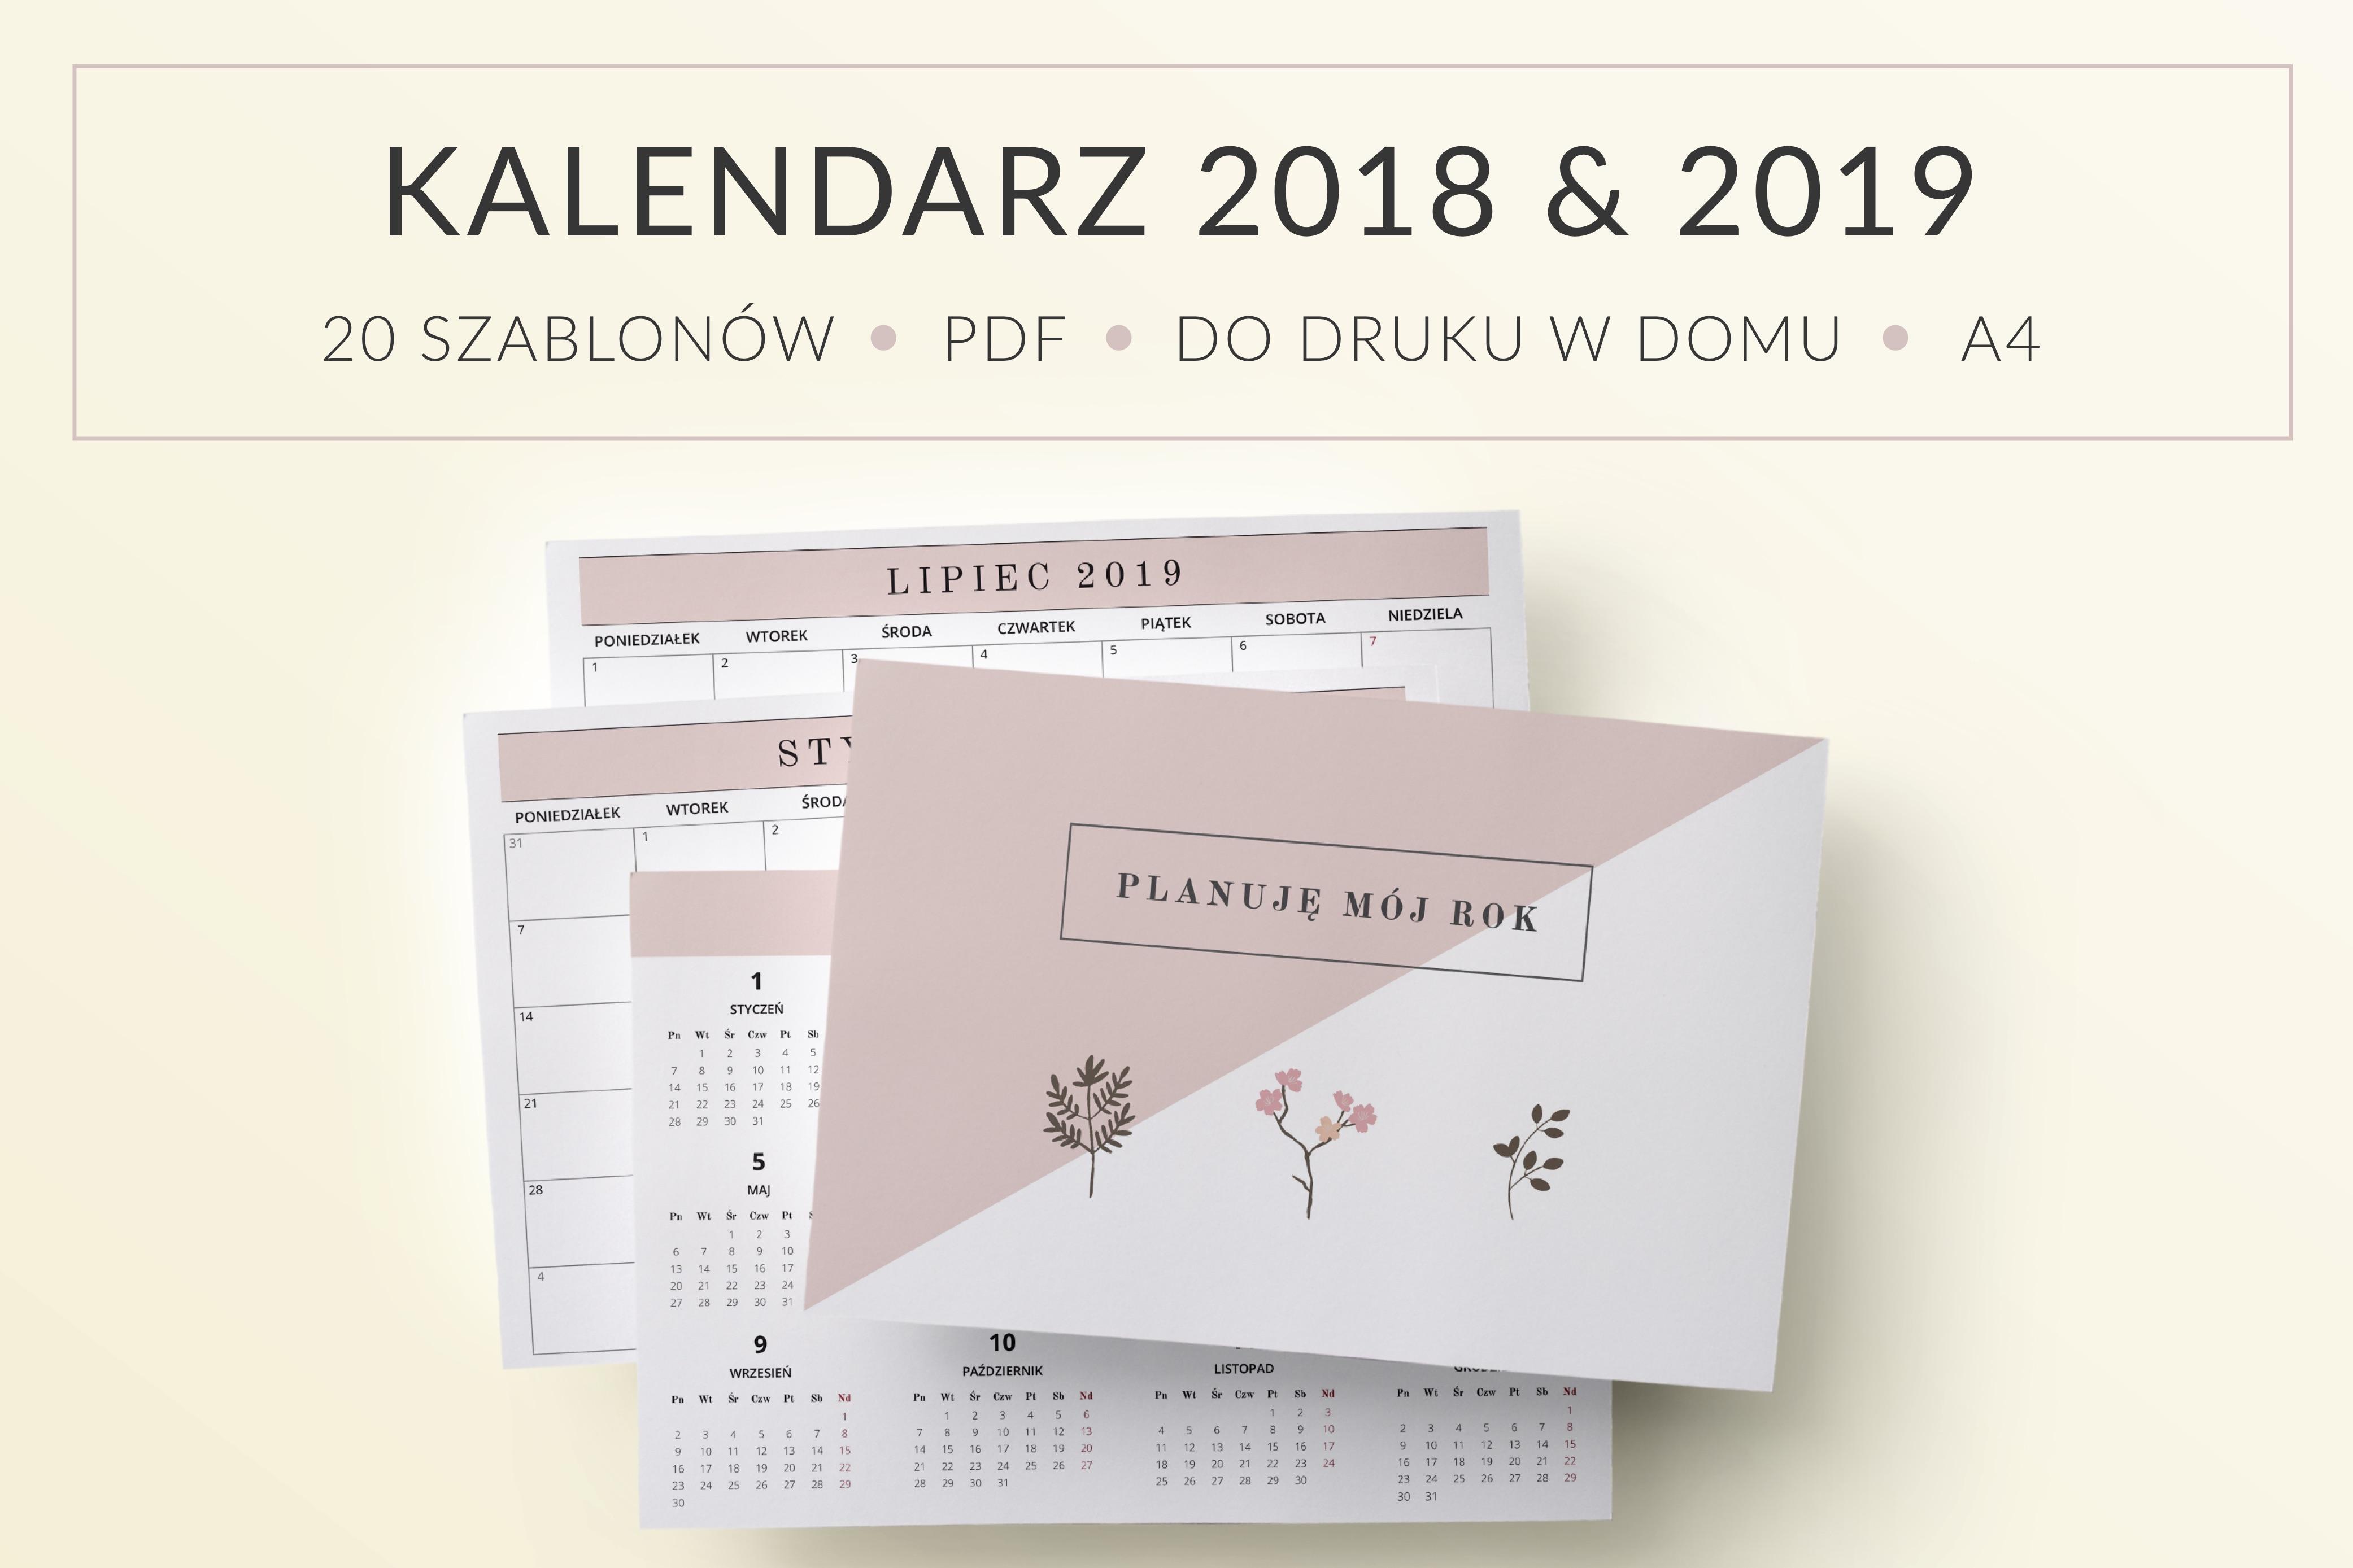 Kalendarz Planer Planuję Mój Rok Do Druku 20182019